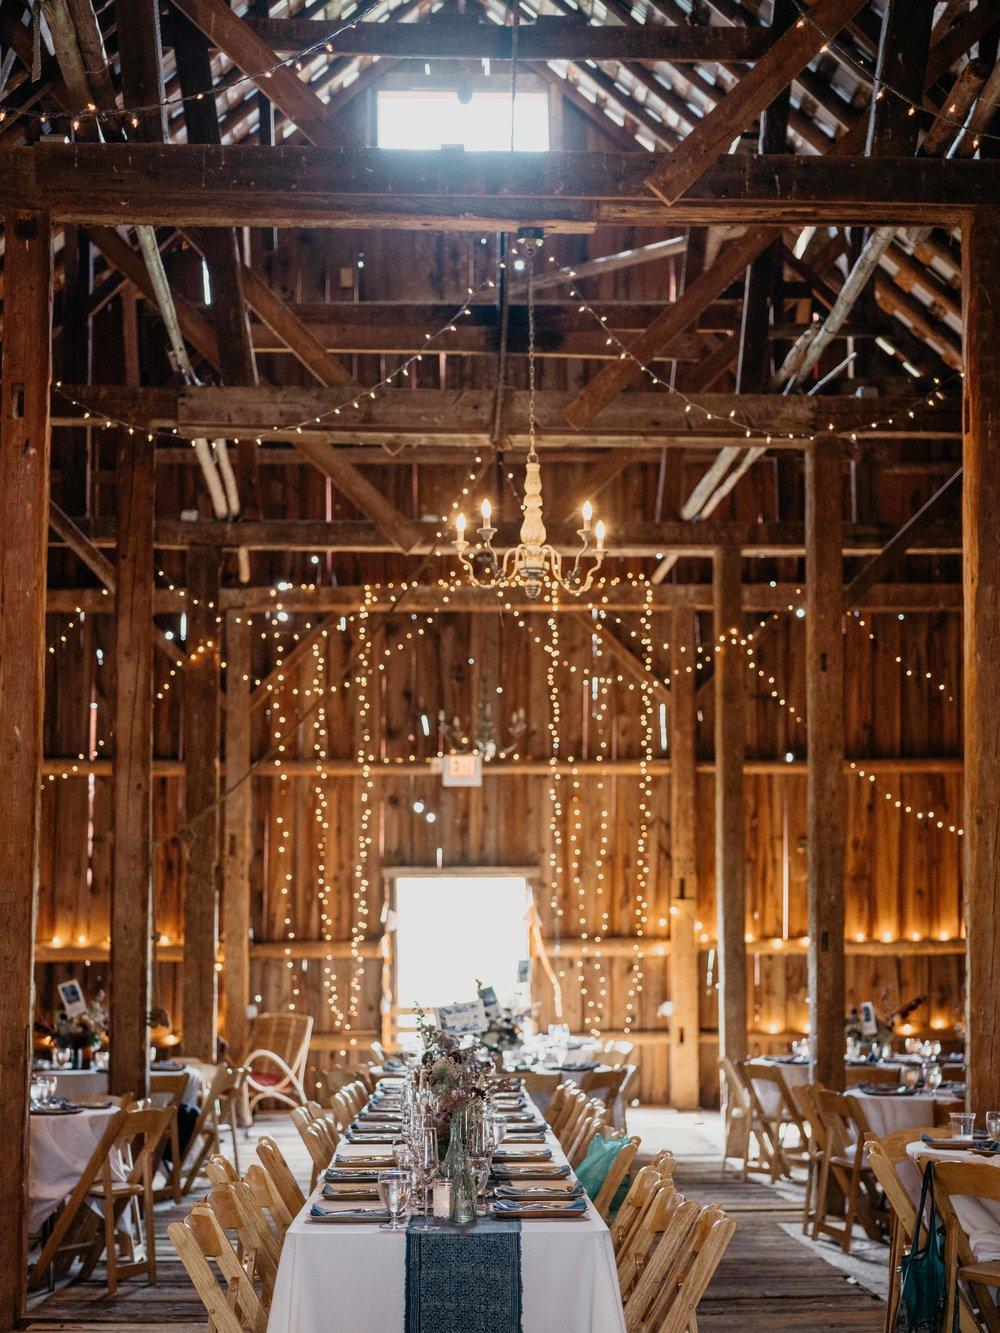 Wiilde-Scout-Photo-Co-Lauren-Steve-Bliss-Ridge-Wedding-Moretown-Vermont-204.jpg